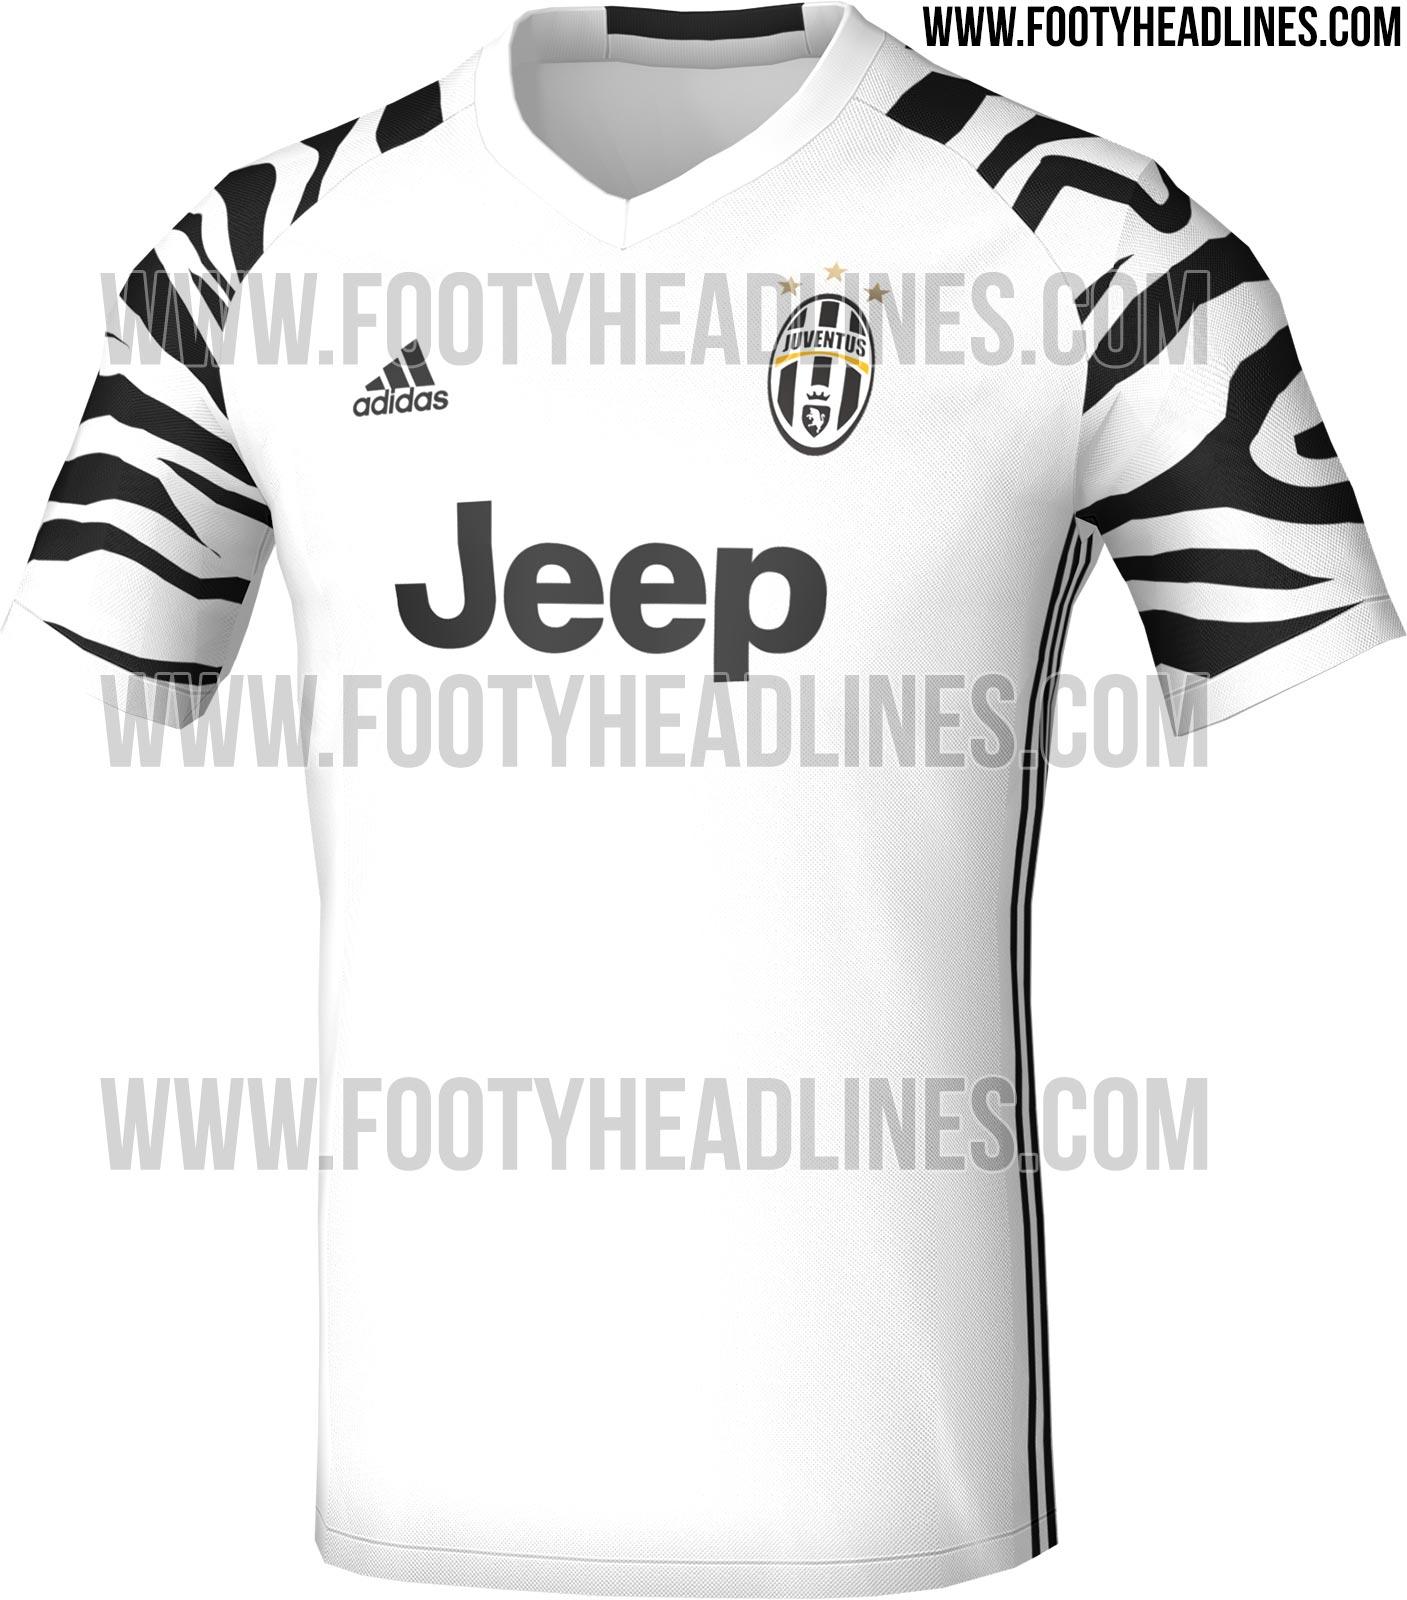 bce652b78d Terceira camisa da Juventus terá estampa de zebra nas mangas  veja ...